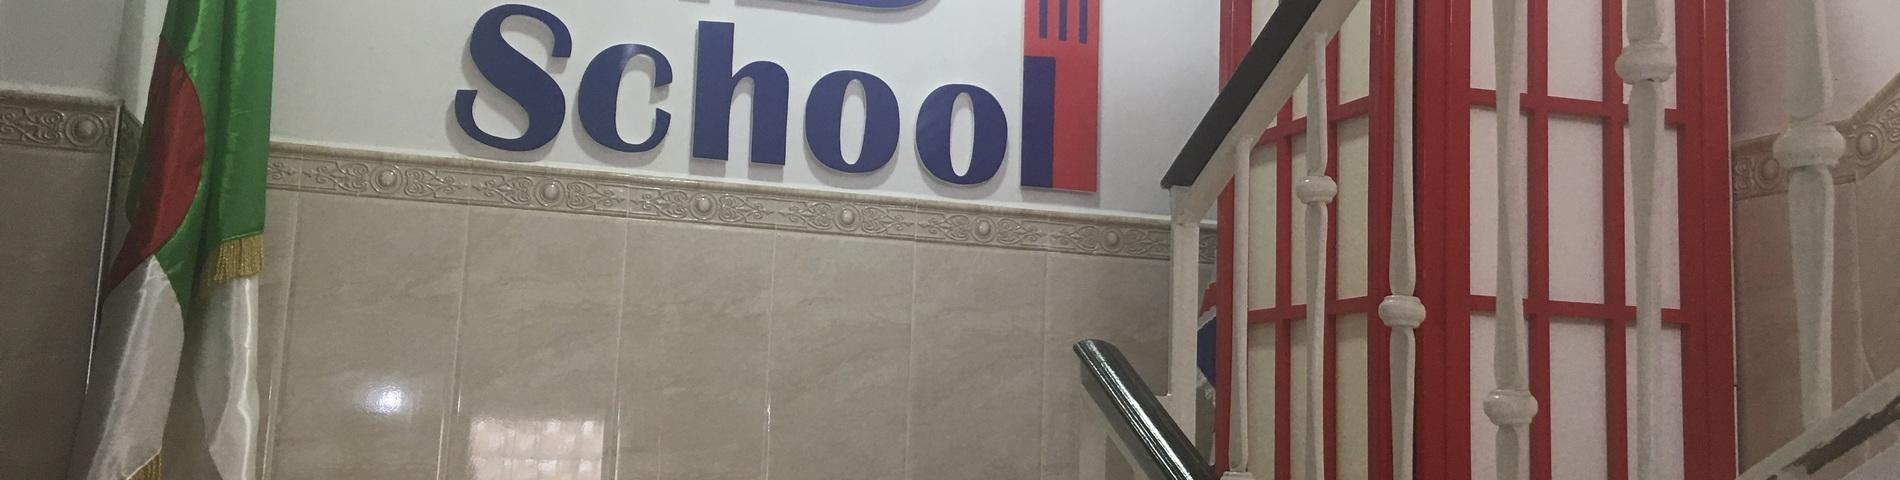 ABI School图片1